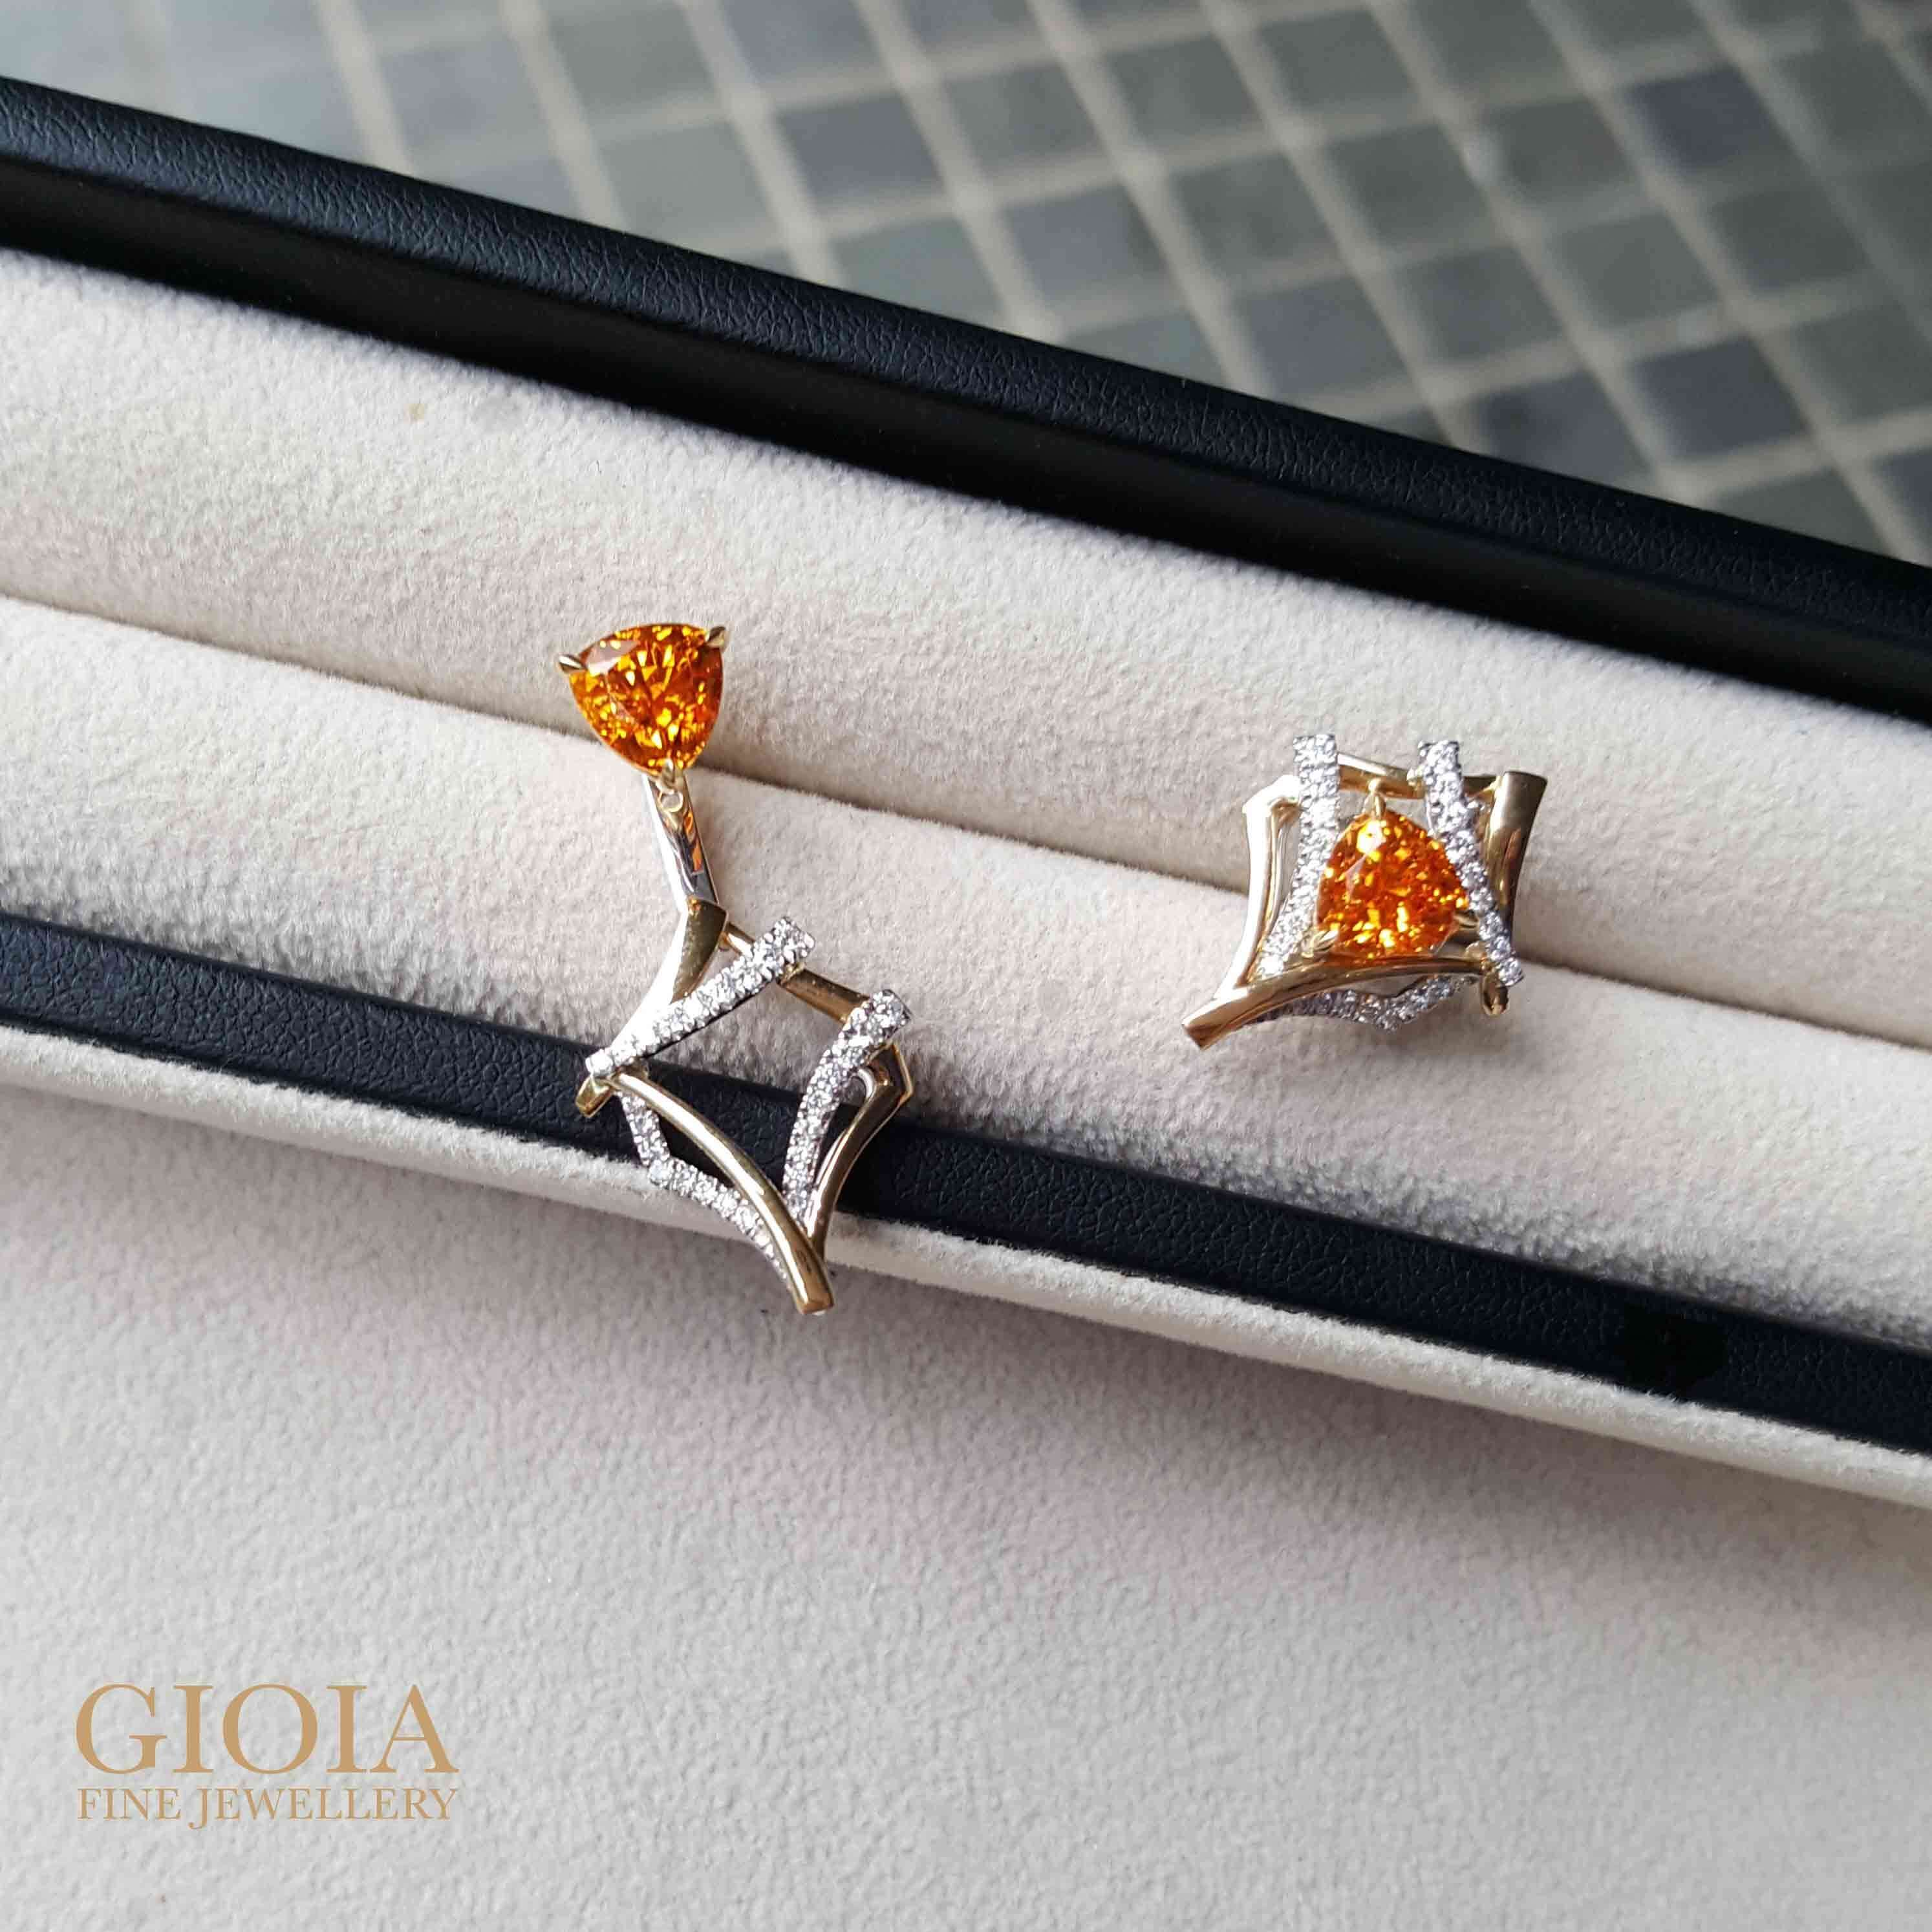 Unique Mandarin Garnet Earring - personalised jewellery, custom made for multiple wear